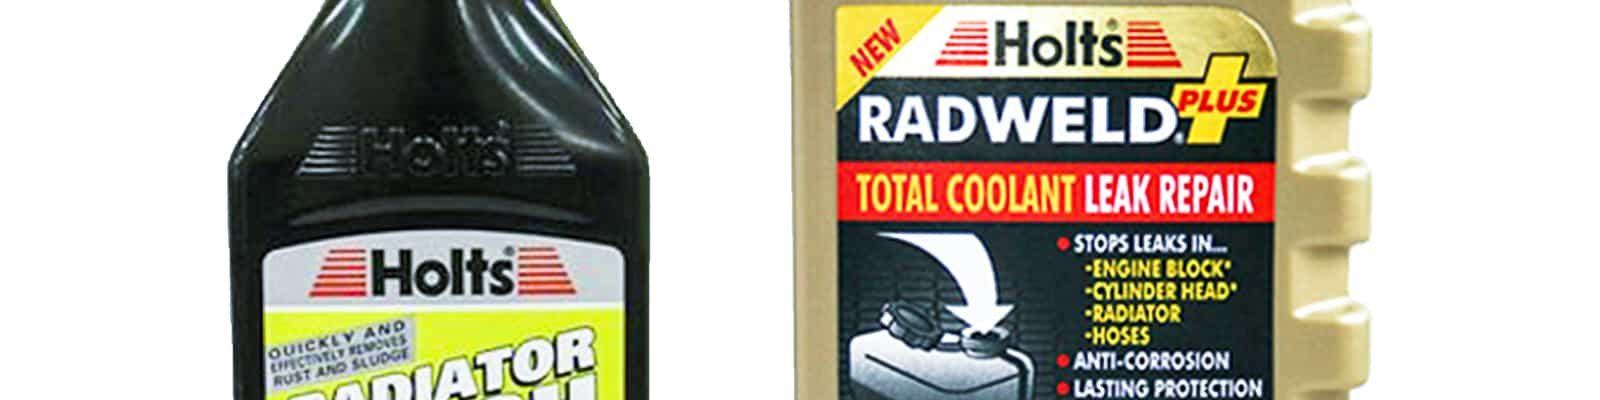 Radiator Products